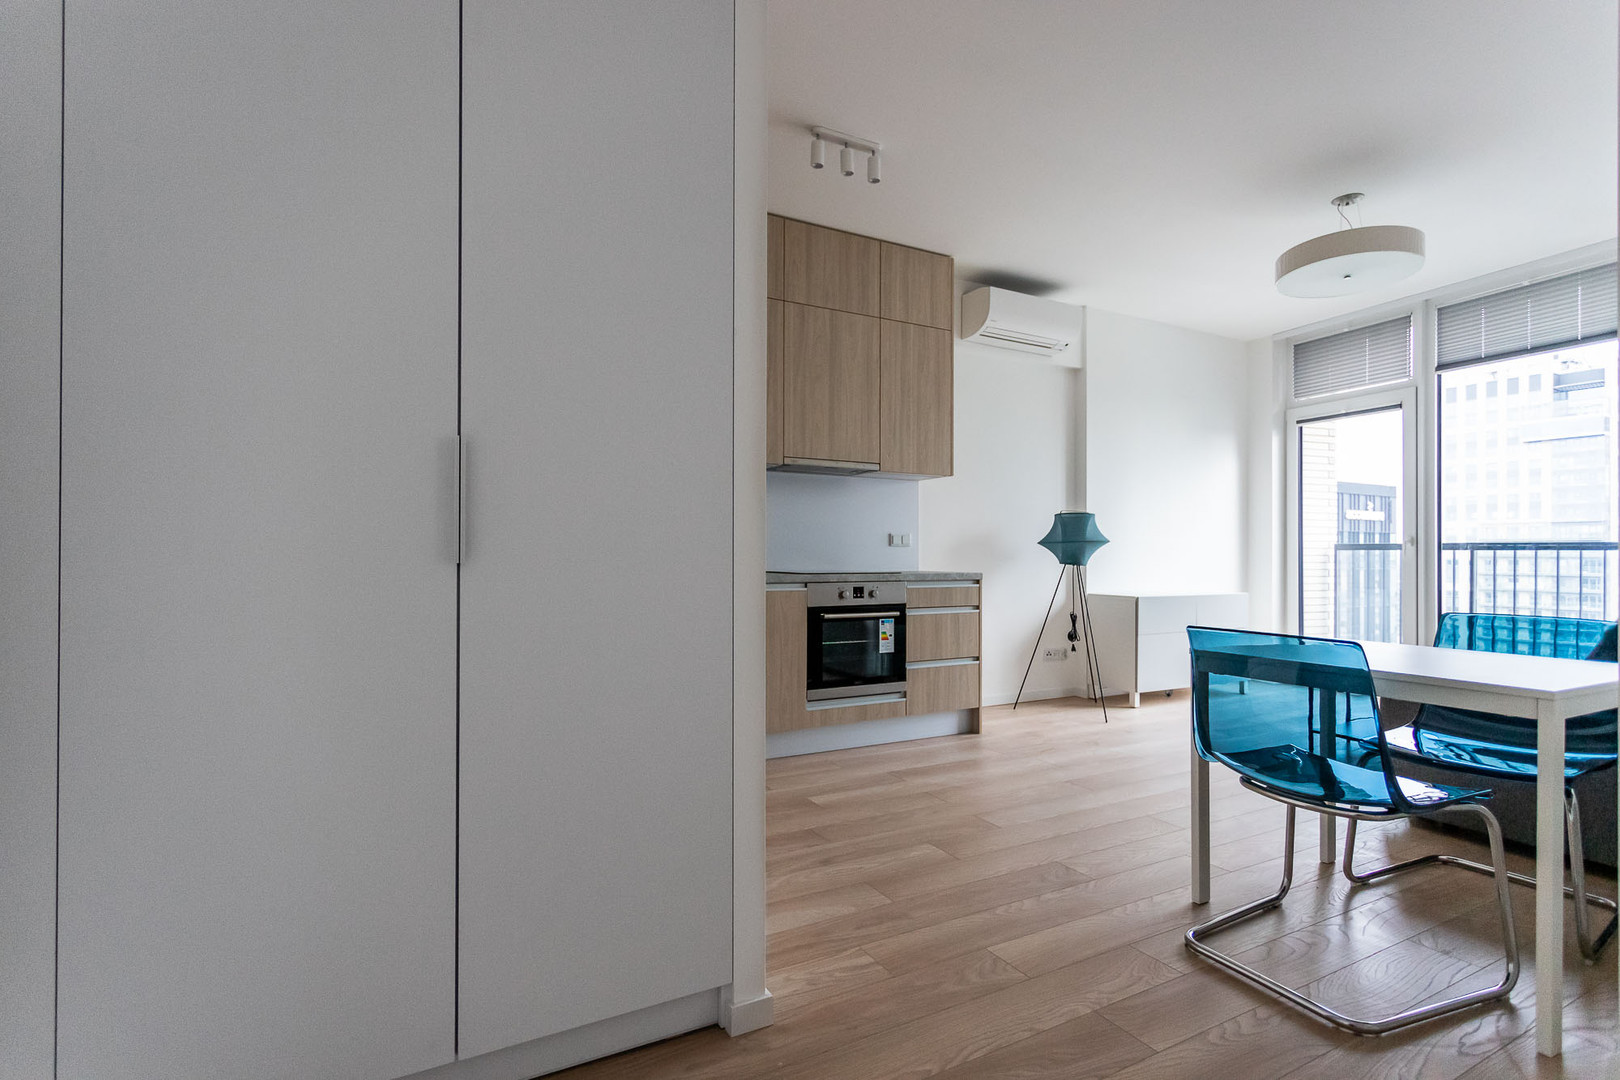 Apartaments to rent Warszawa Browary_.jp